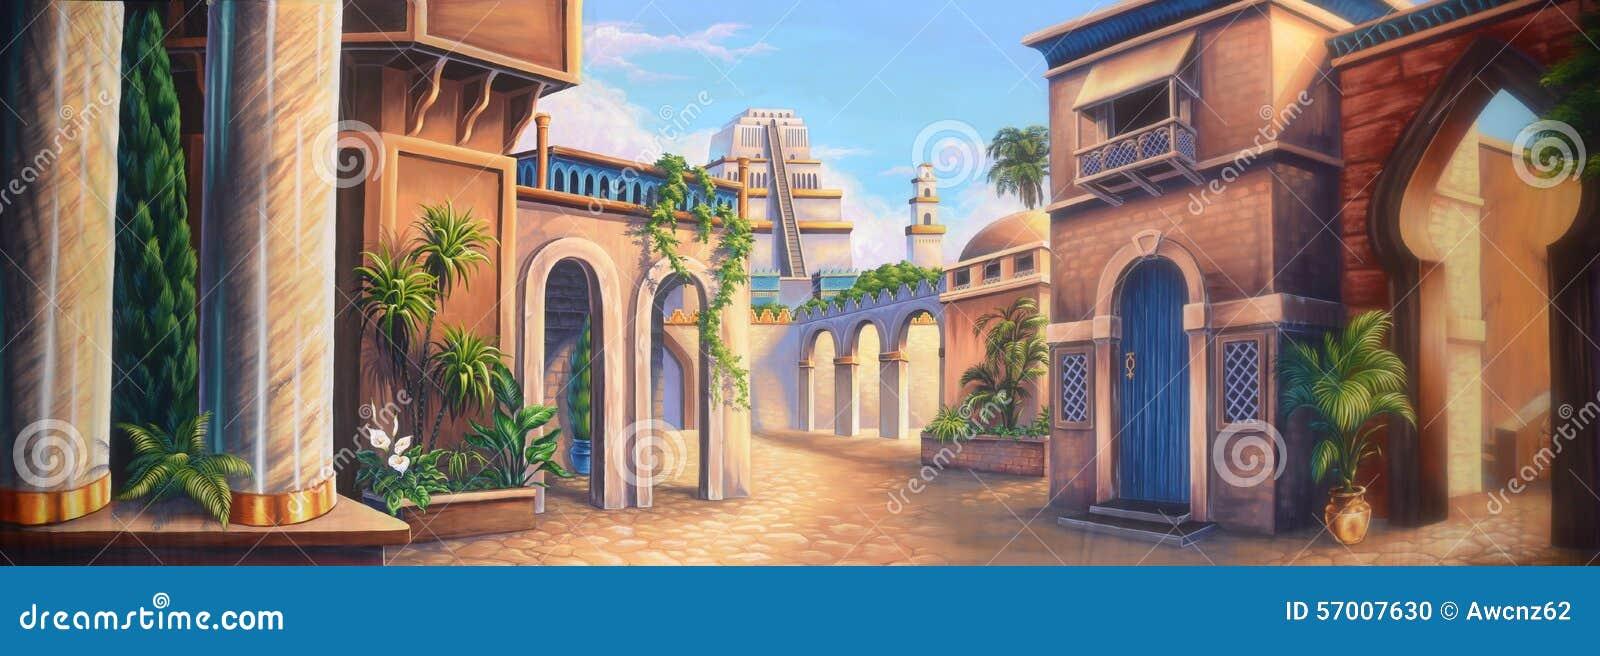 Babilonia antiguo